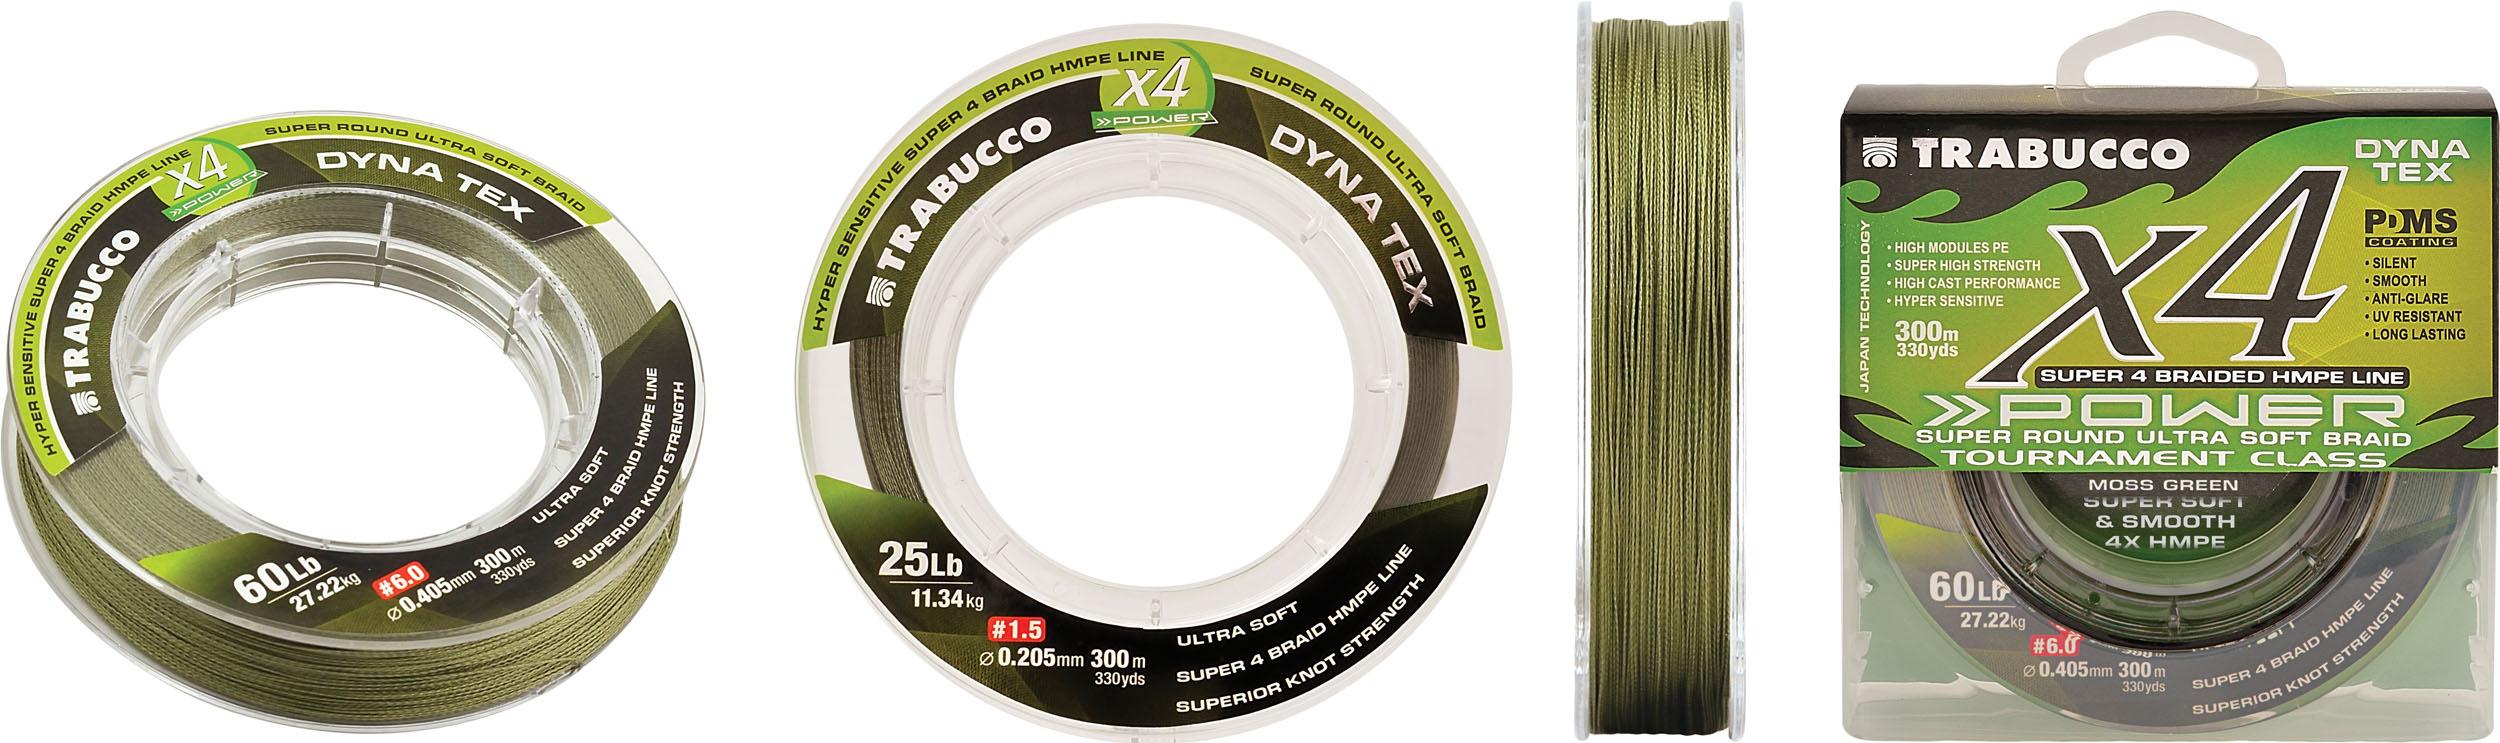 Trabucco Dyna Tex X4 Power 300m 0.285mm MOSS GREEN